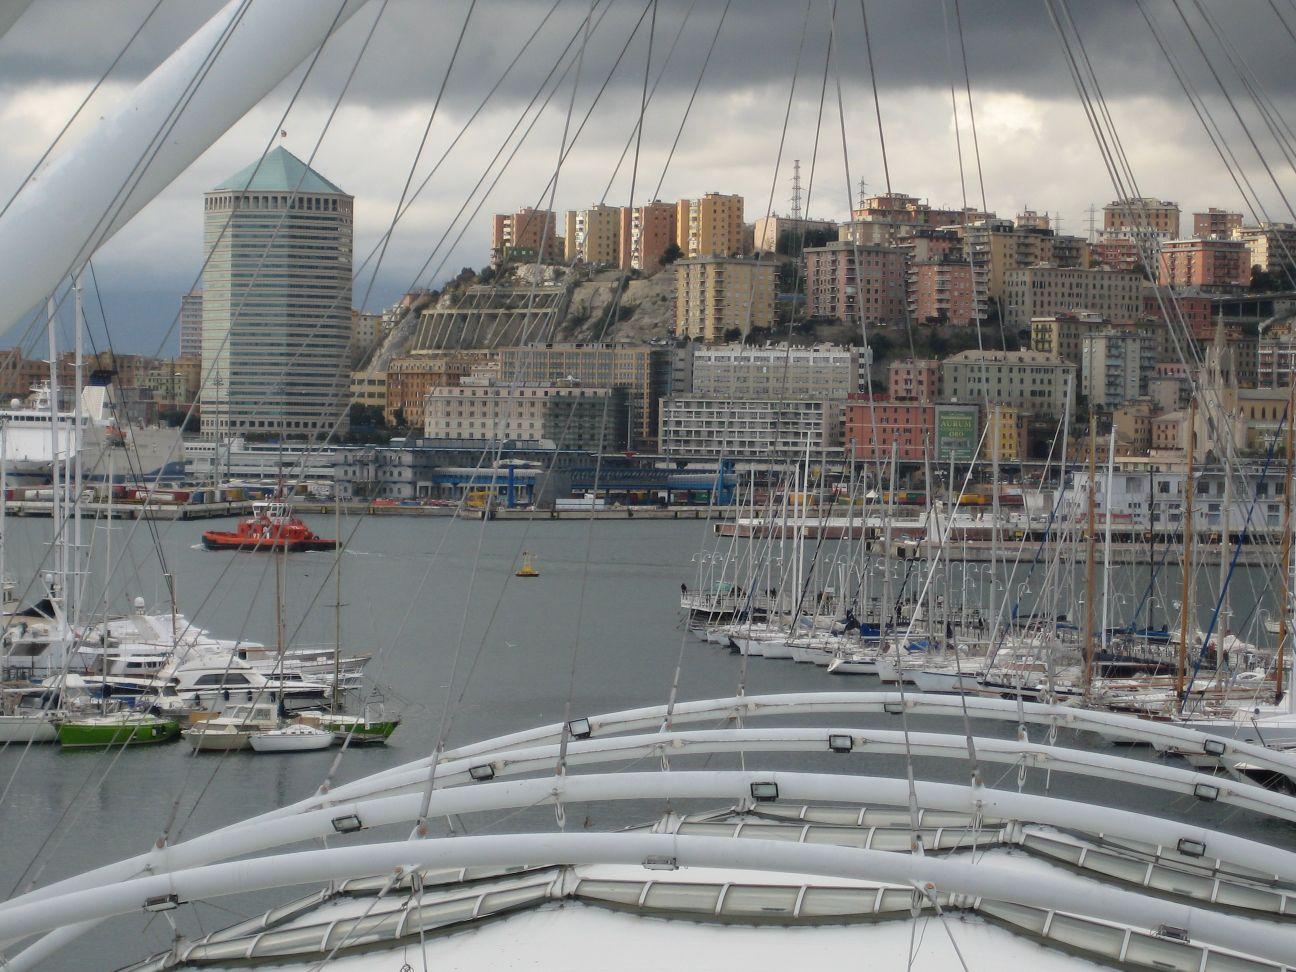 TOP WORLD TRAVEL DESTINATIONS: Genoa, Italy